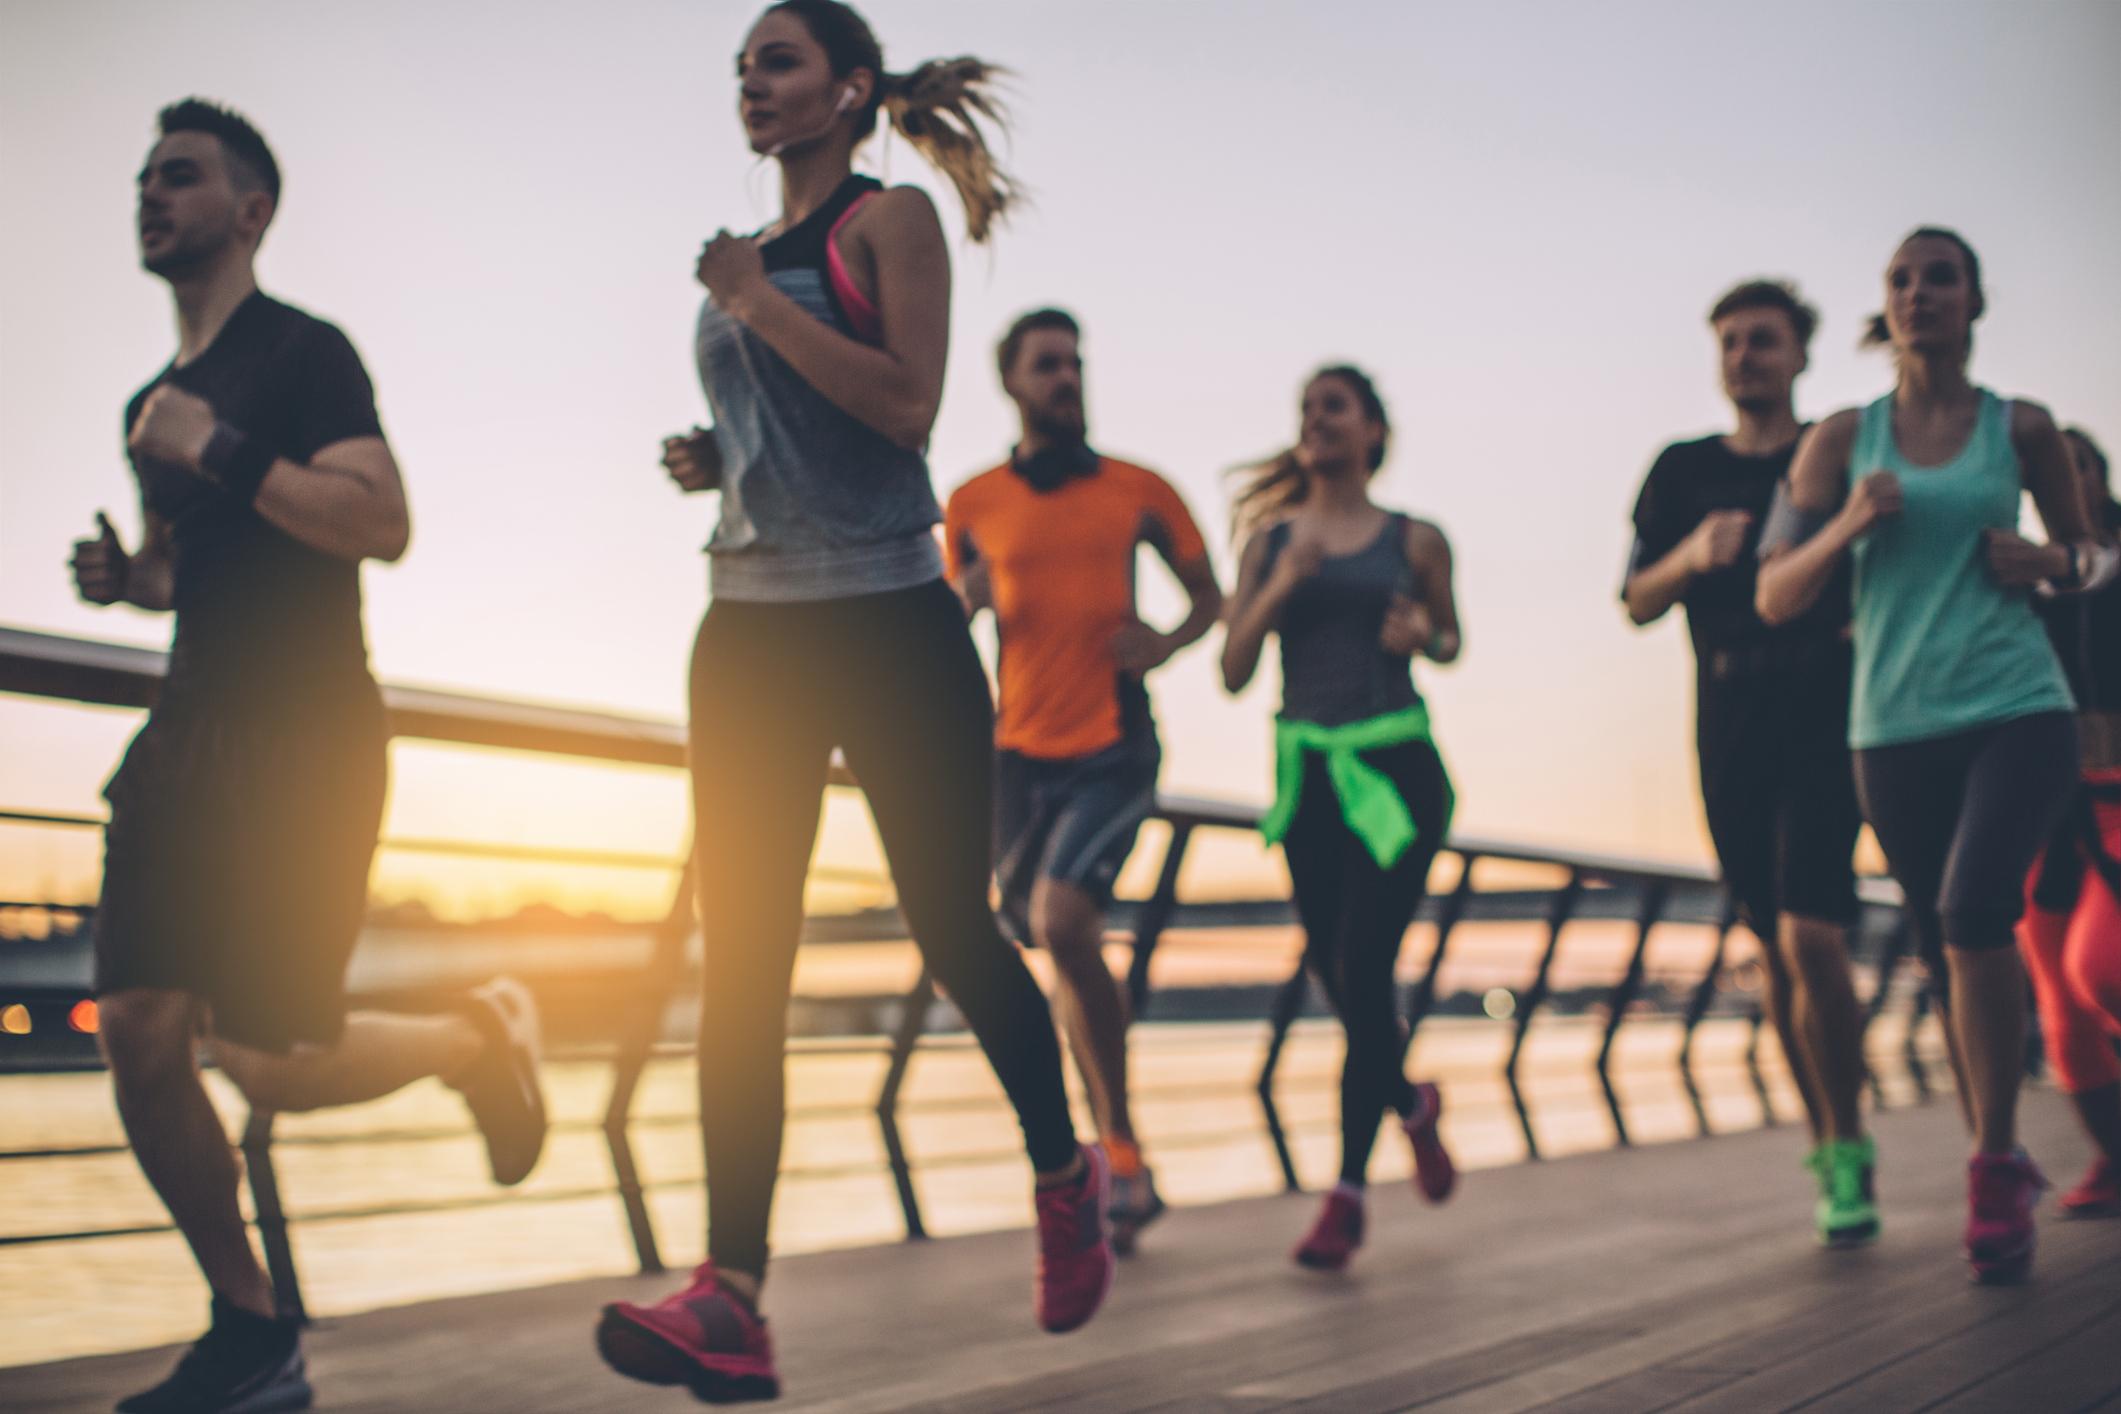 Runners running across a bridge with bibs on